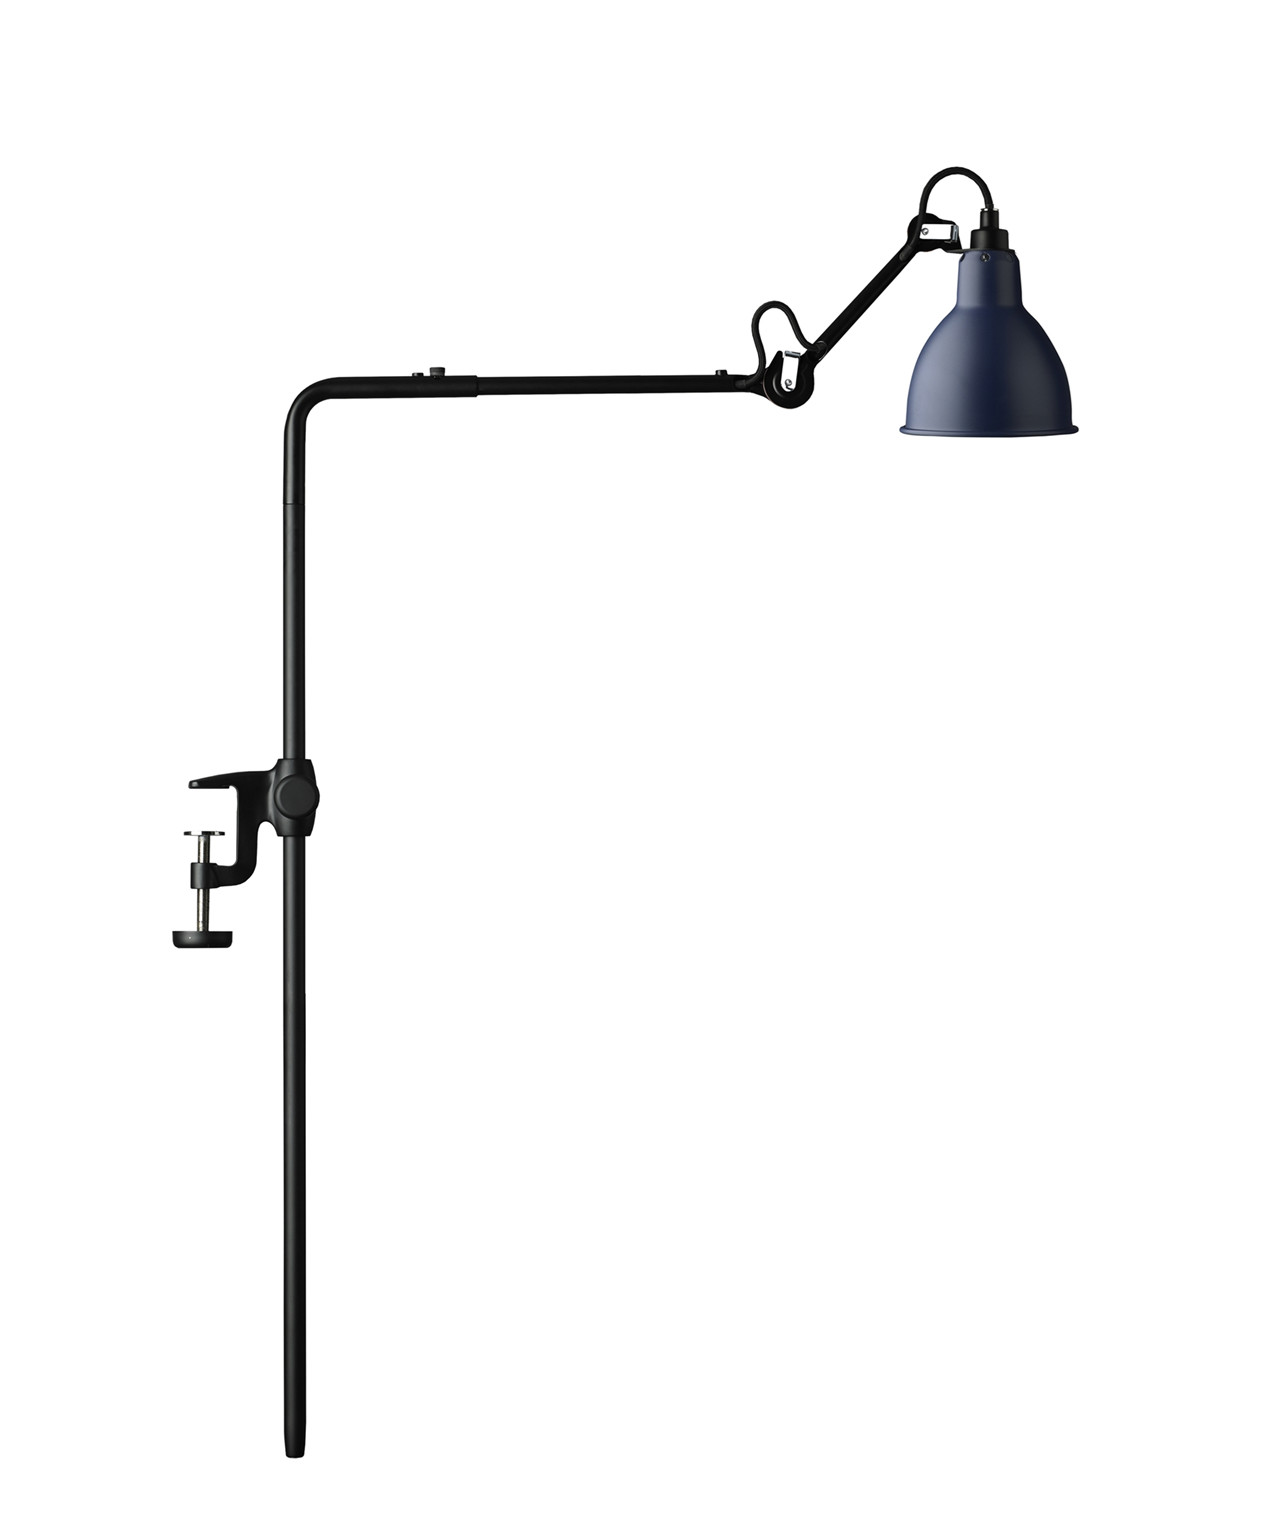 226 Bordslampa Blå - Lampe Gras